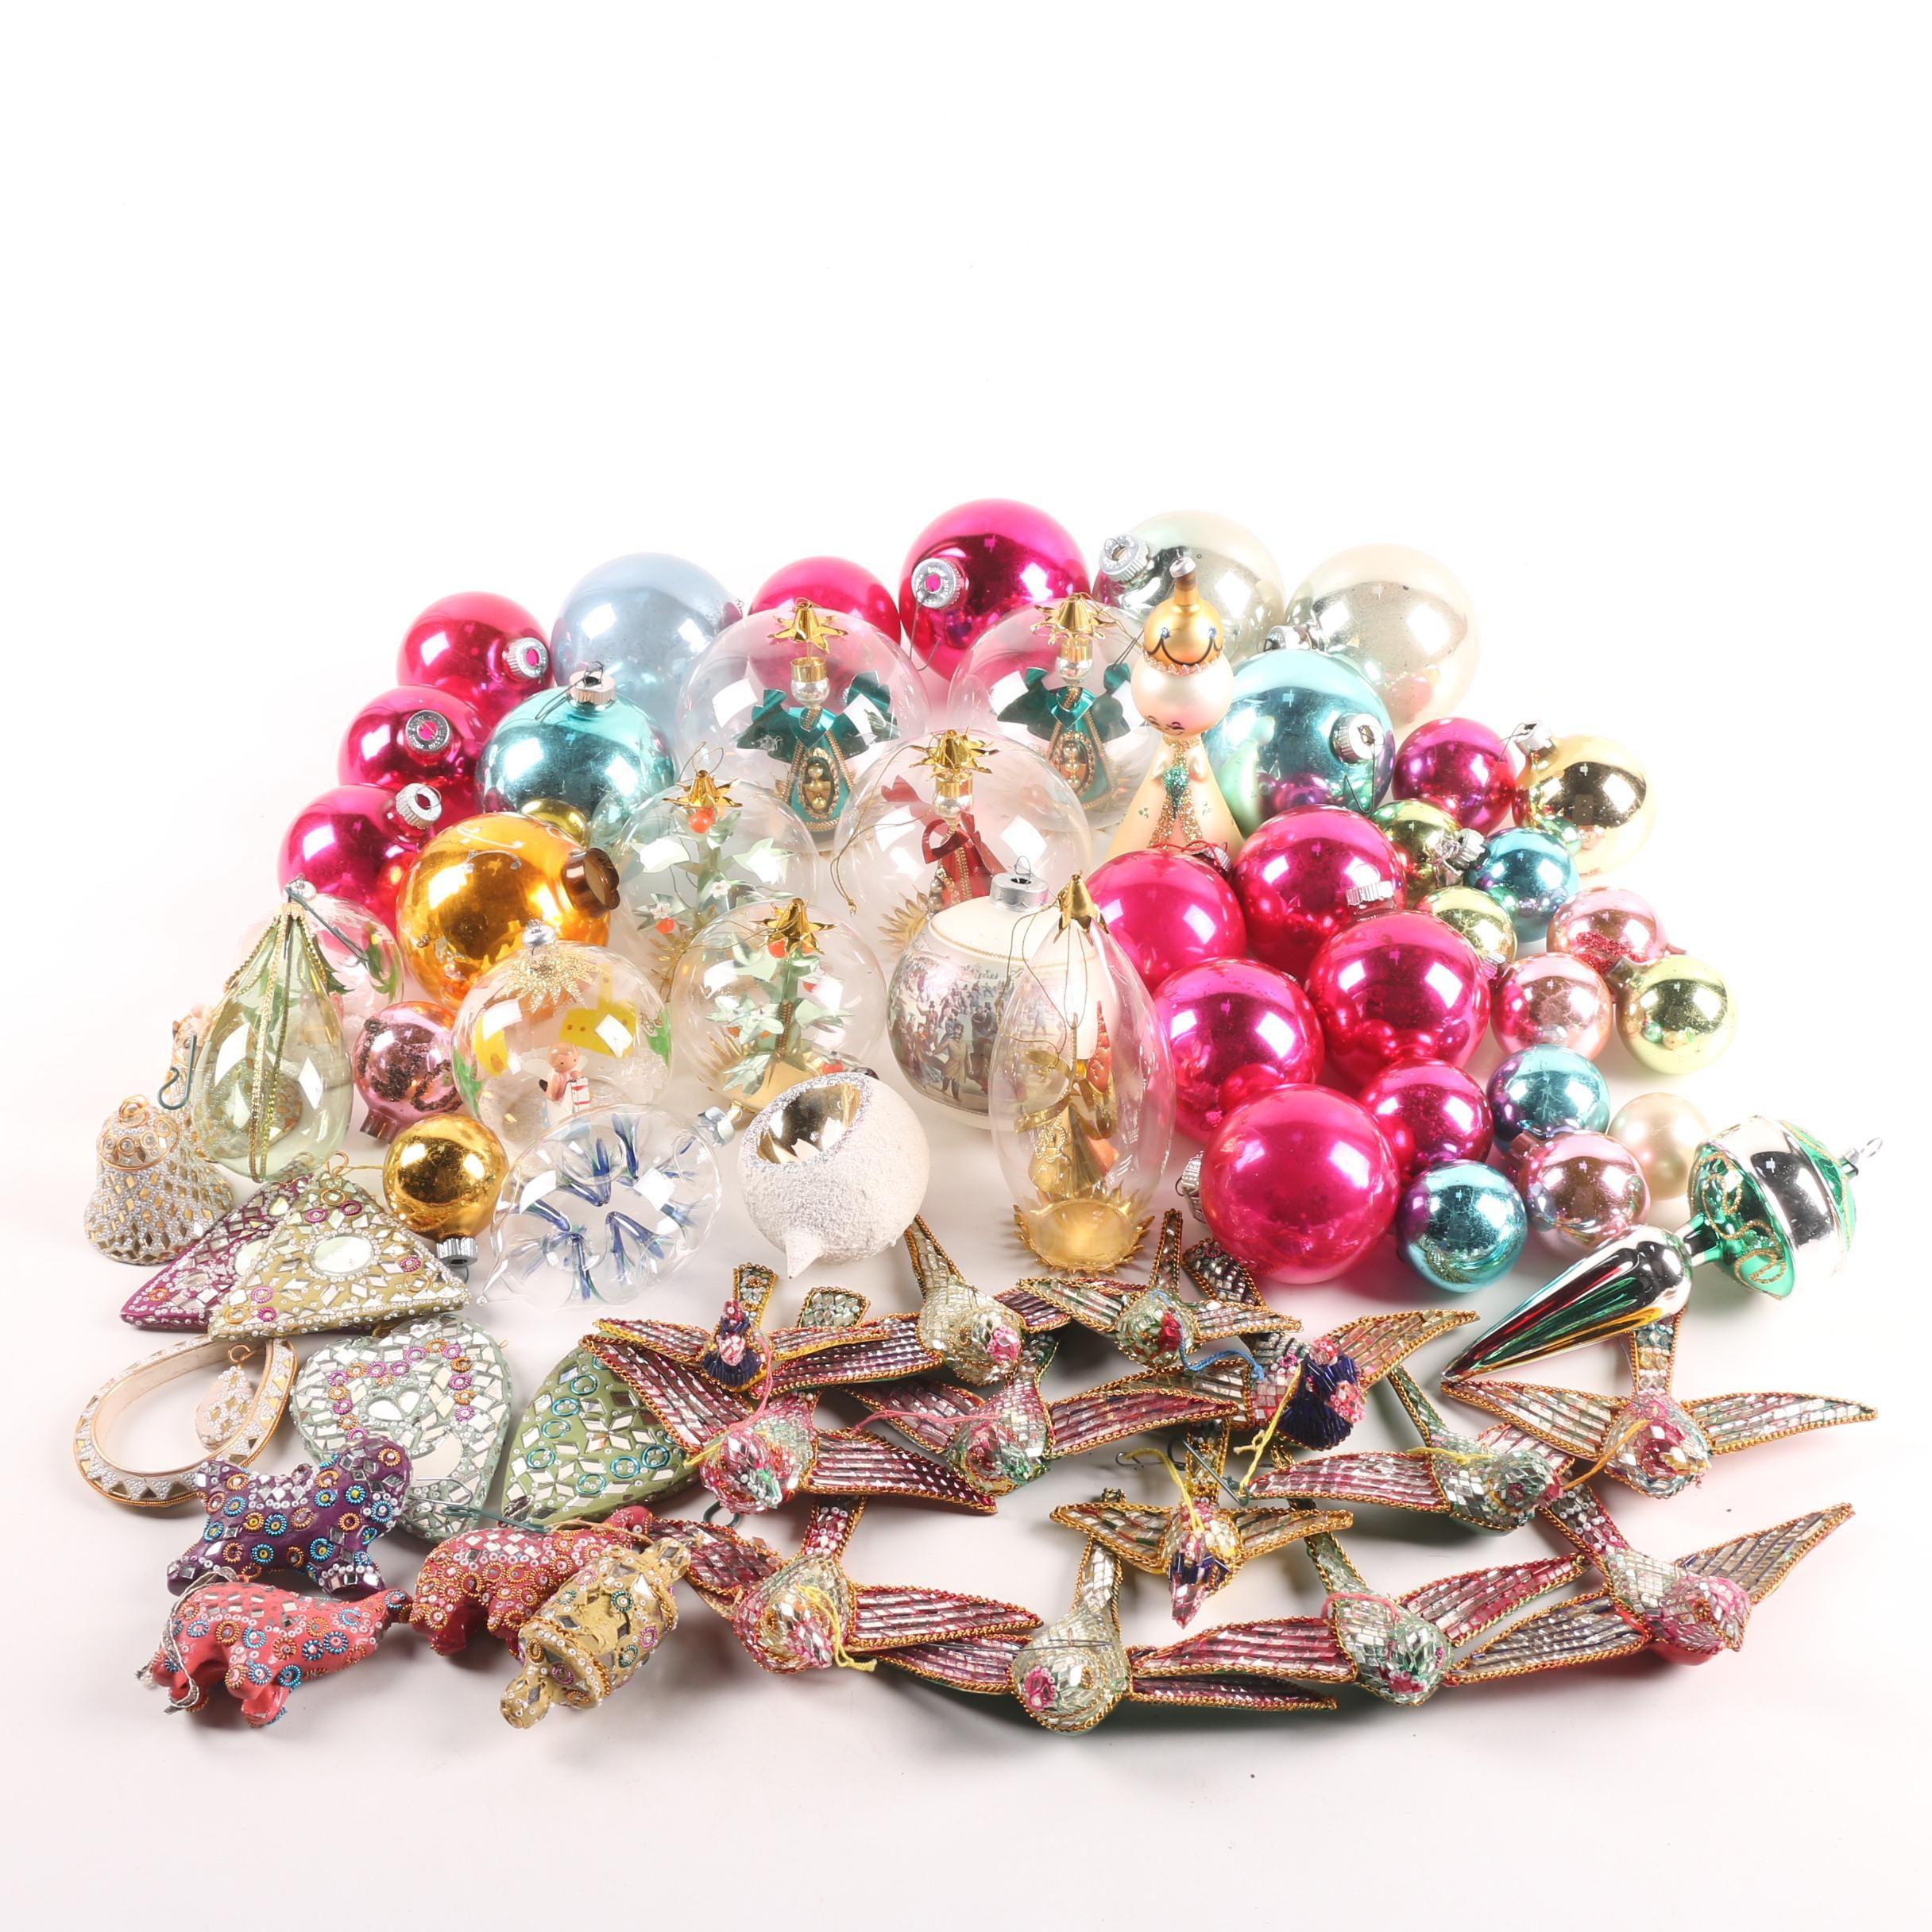 Vintage Mosaic Bird and Glass Ball Christmas Ornaments